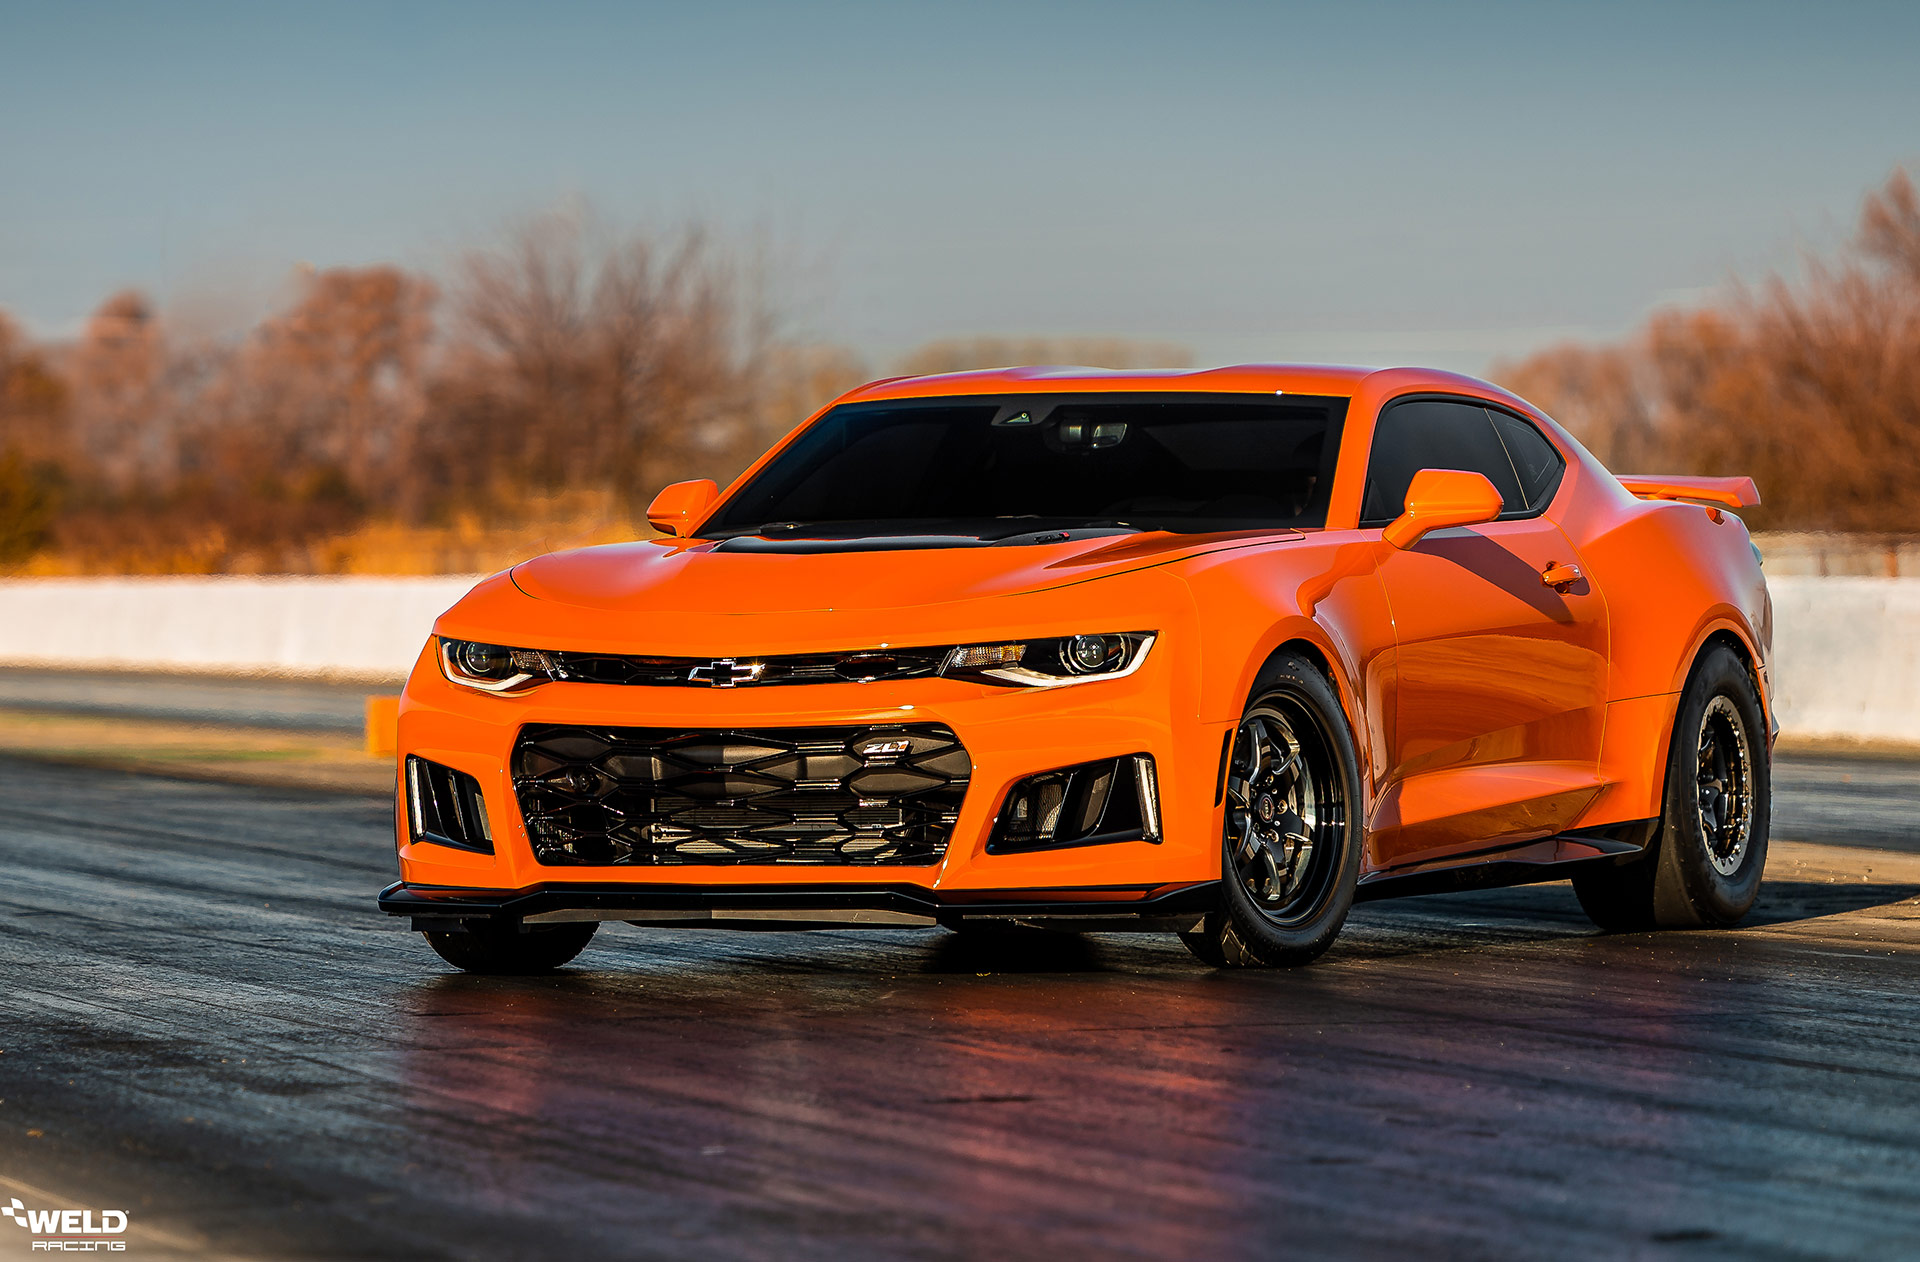 Orange Street Car Take Over Chevrolet Camaro ZL1 - WELD S79 Wheels